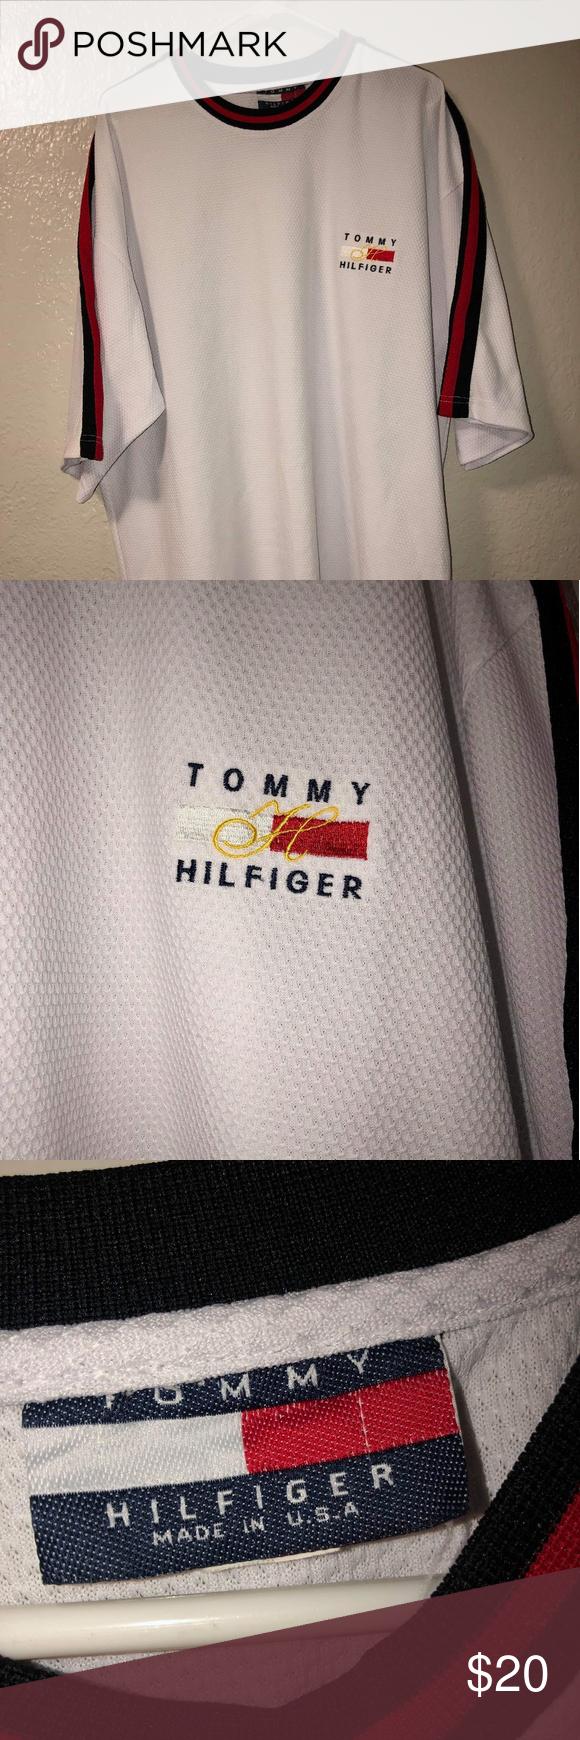 3d11b1945 Tommy Hilfiger Shirt Tommy Hilfiger Shirt Size XXL Condition 10/10 . #NIKE #